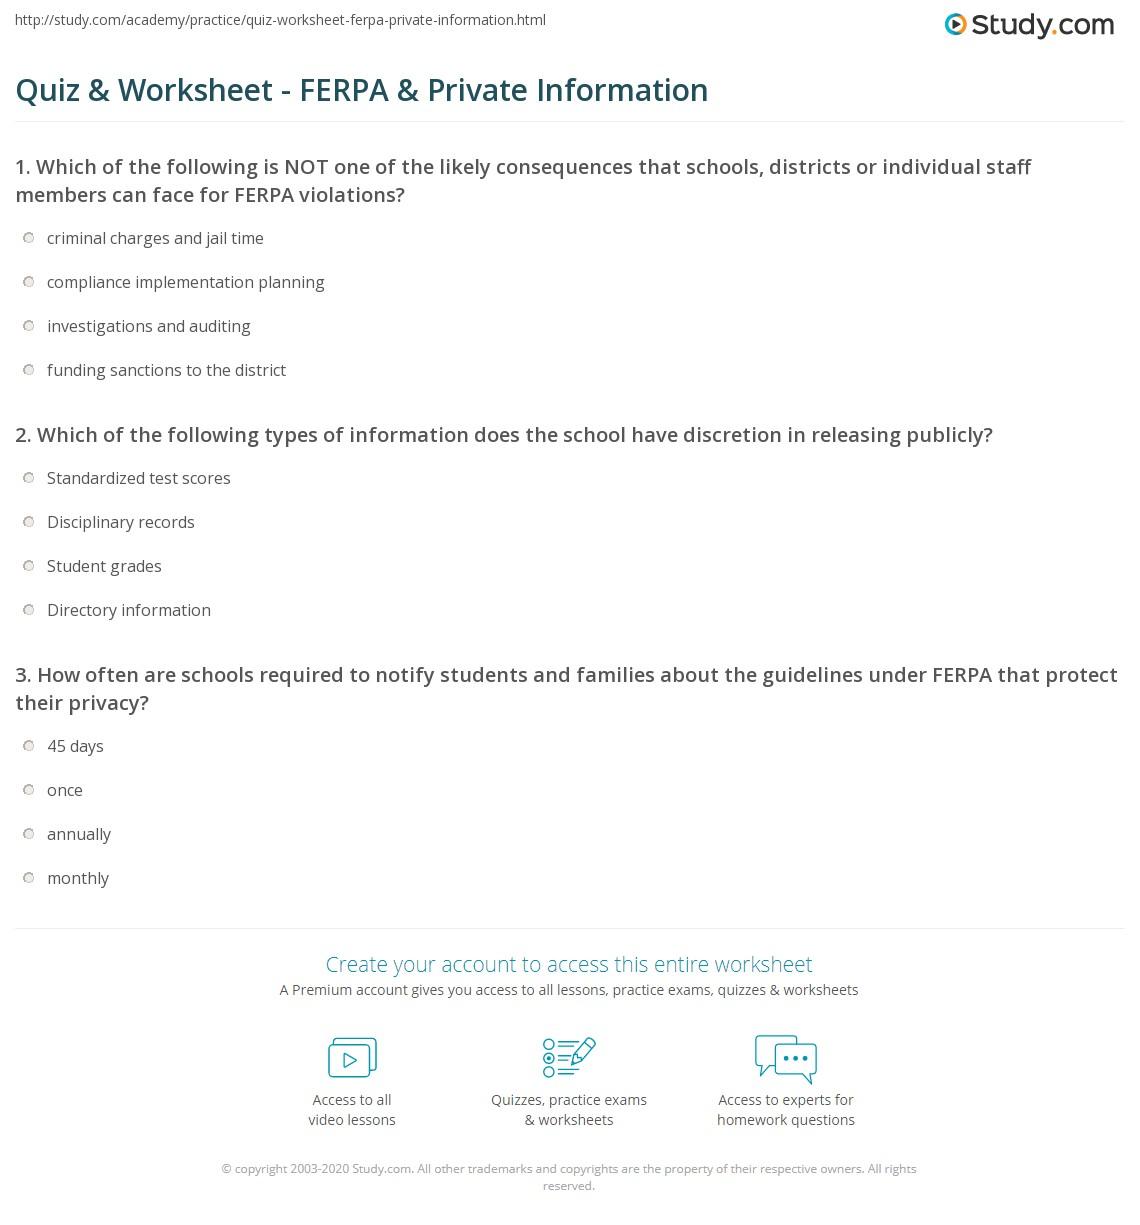 Quiz Worksheet Ferpa Private Information Study